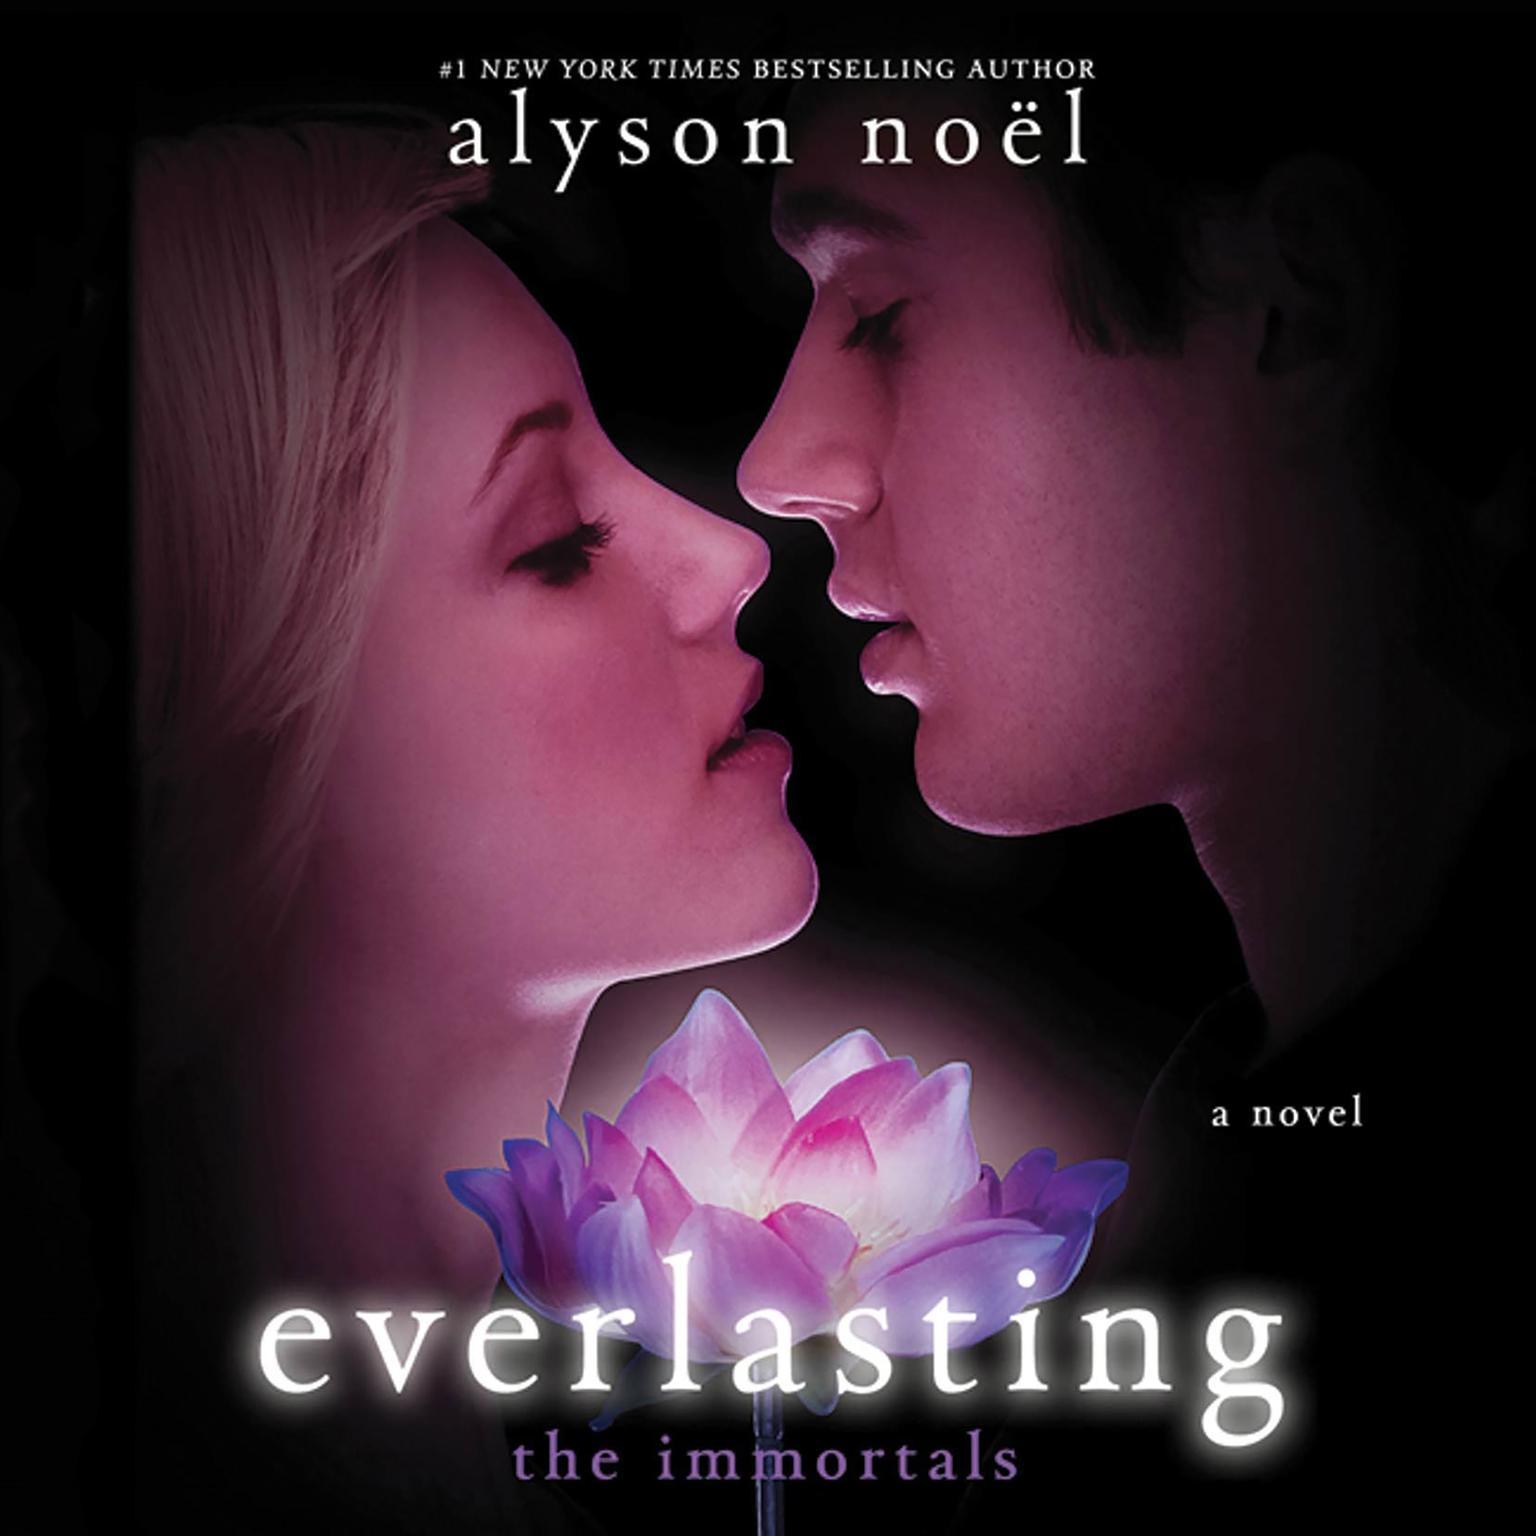 Everlasting: A Novel Audiobook, by Alyson Noël